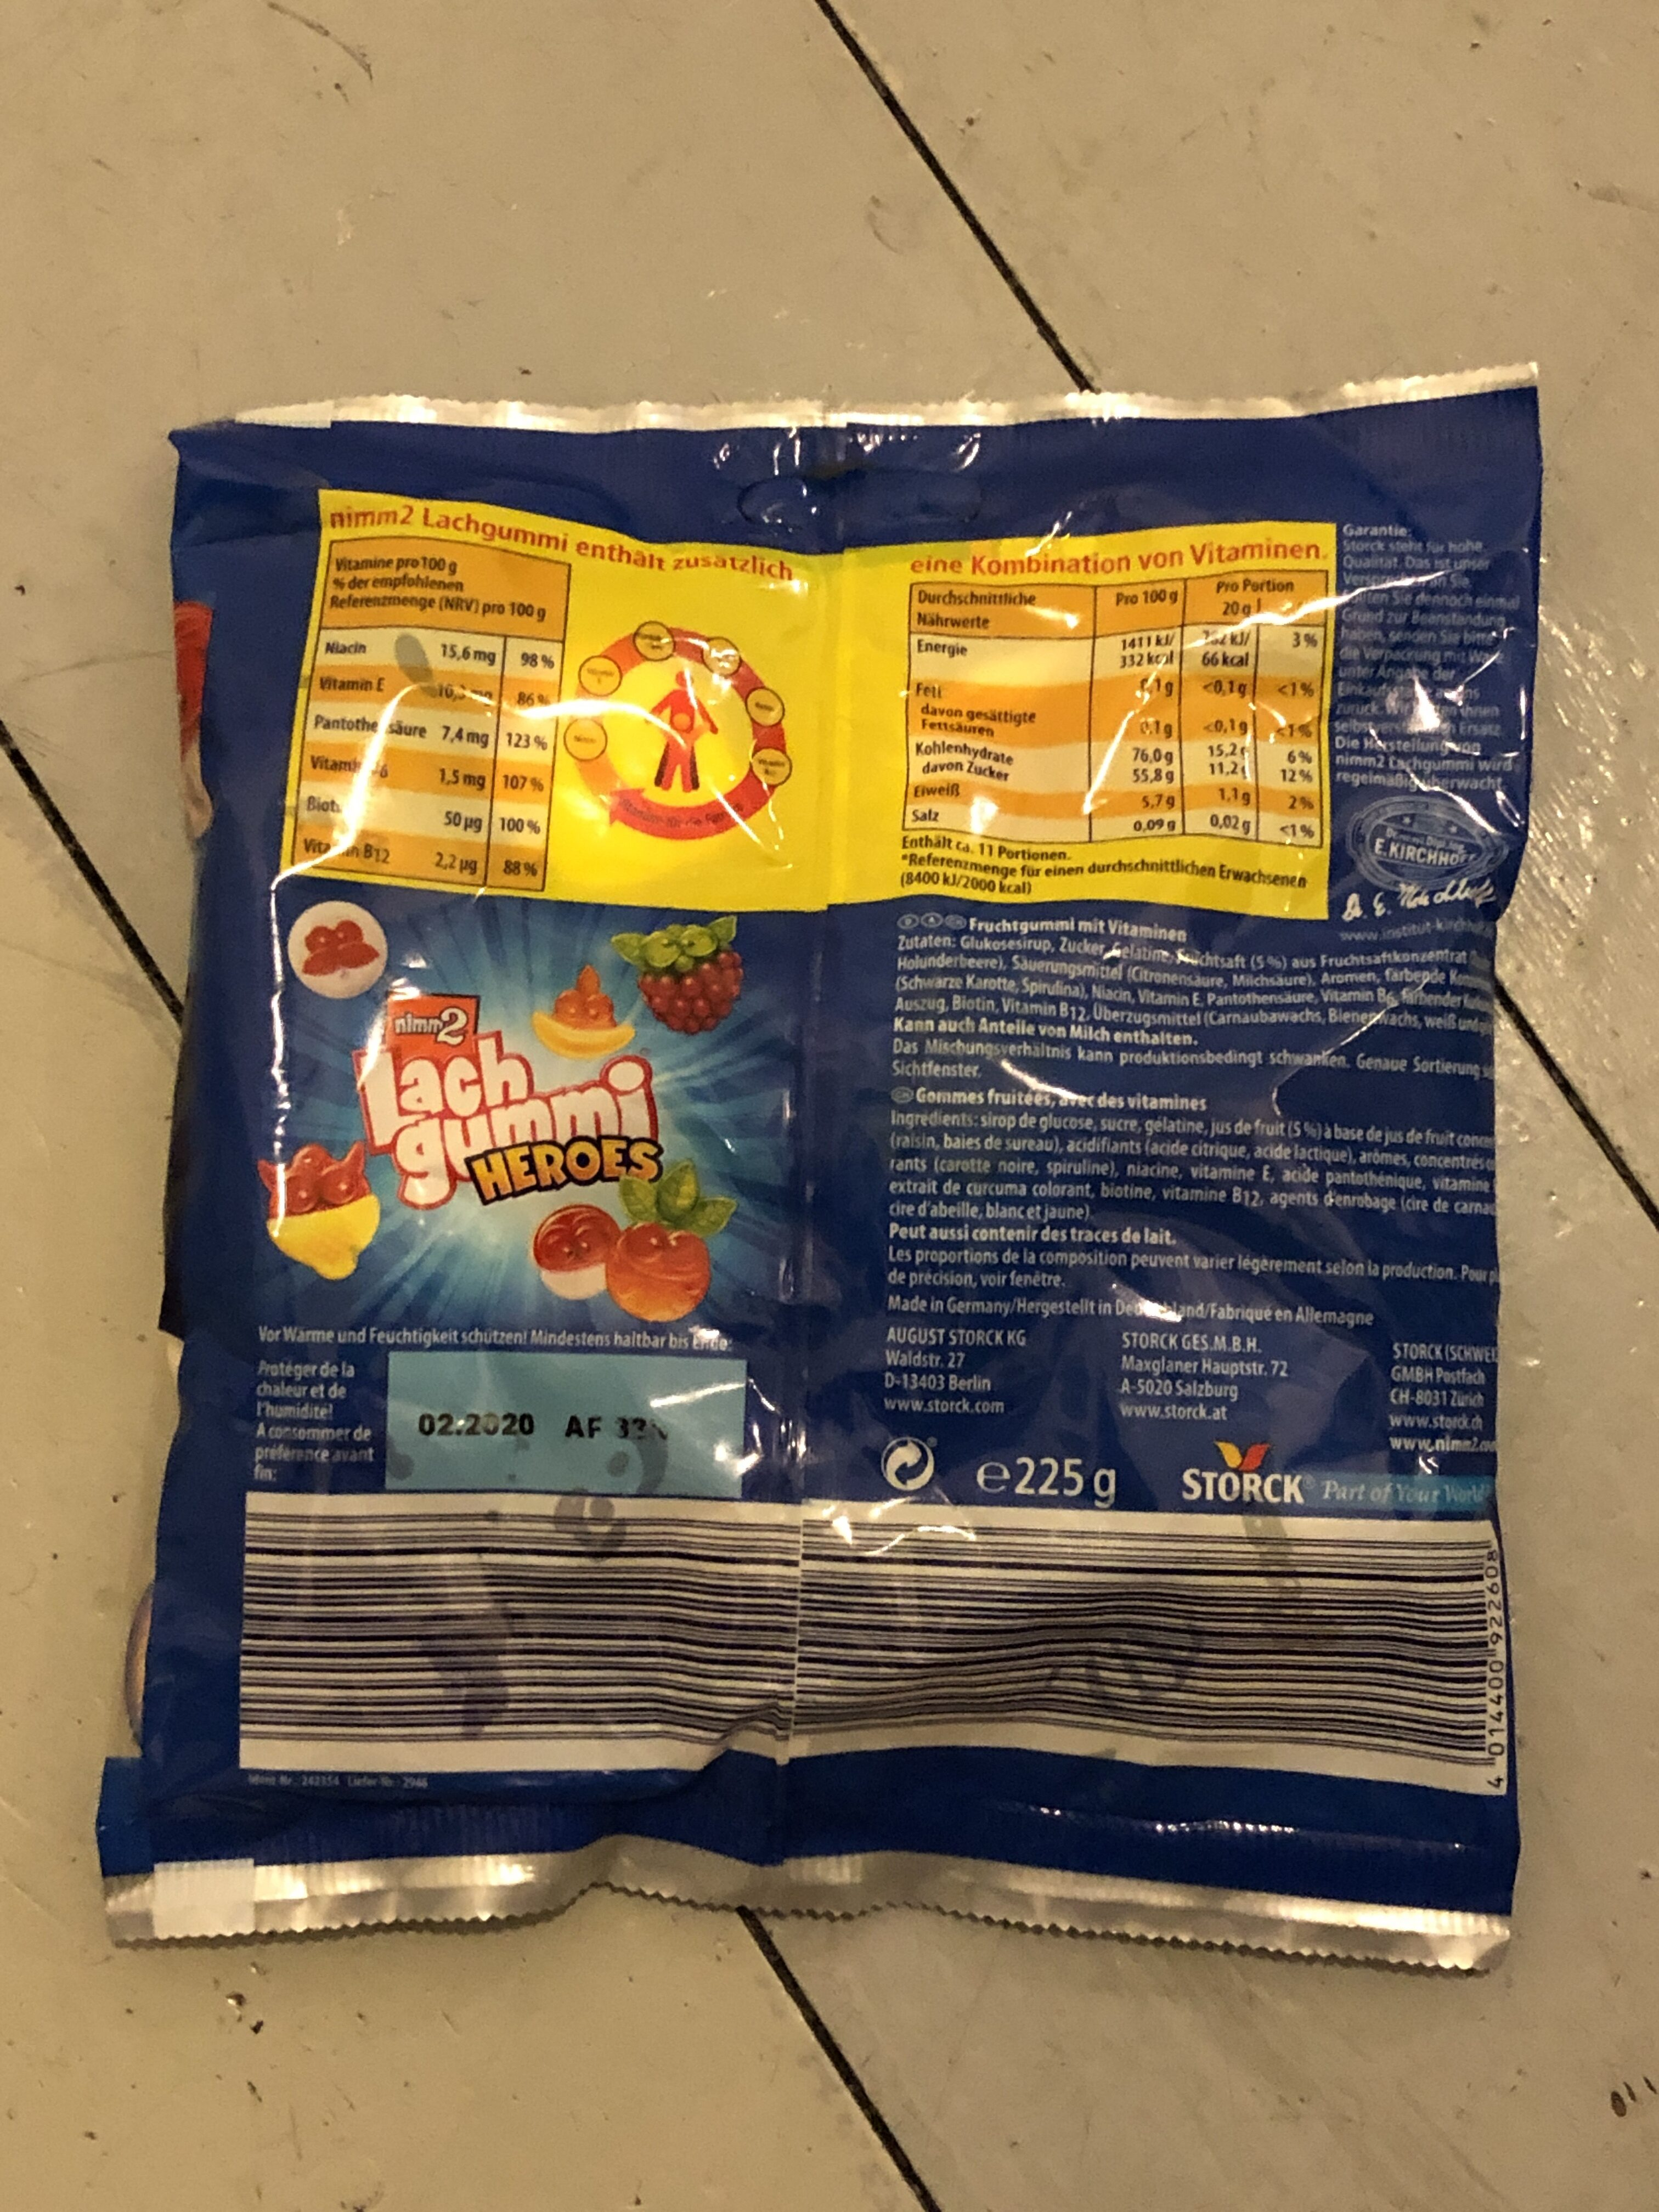 Nimm2 Lachgummi Heroes - Nutrition facts - en